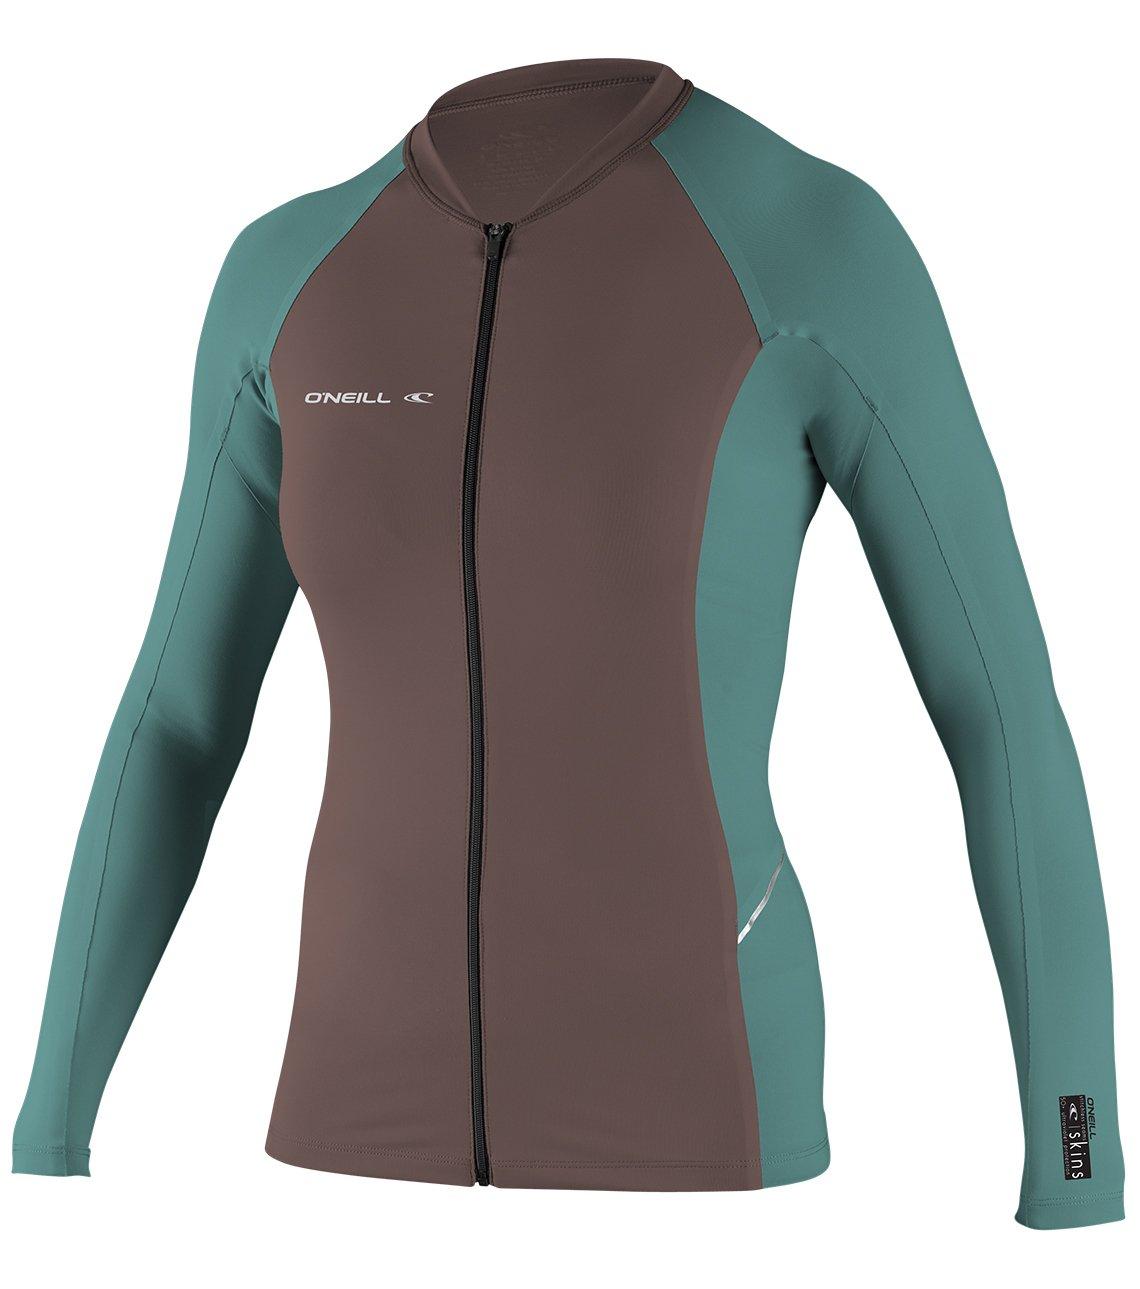 O'Neill Women's Premium Skins Stitchless UPF 50+ Long Sleeve Full Zip Jacket, Pepper/AquaHaze, Medium